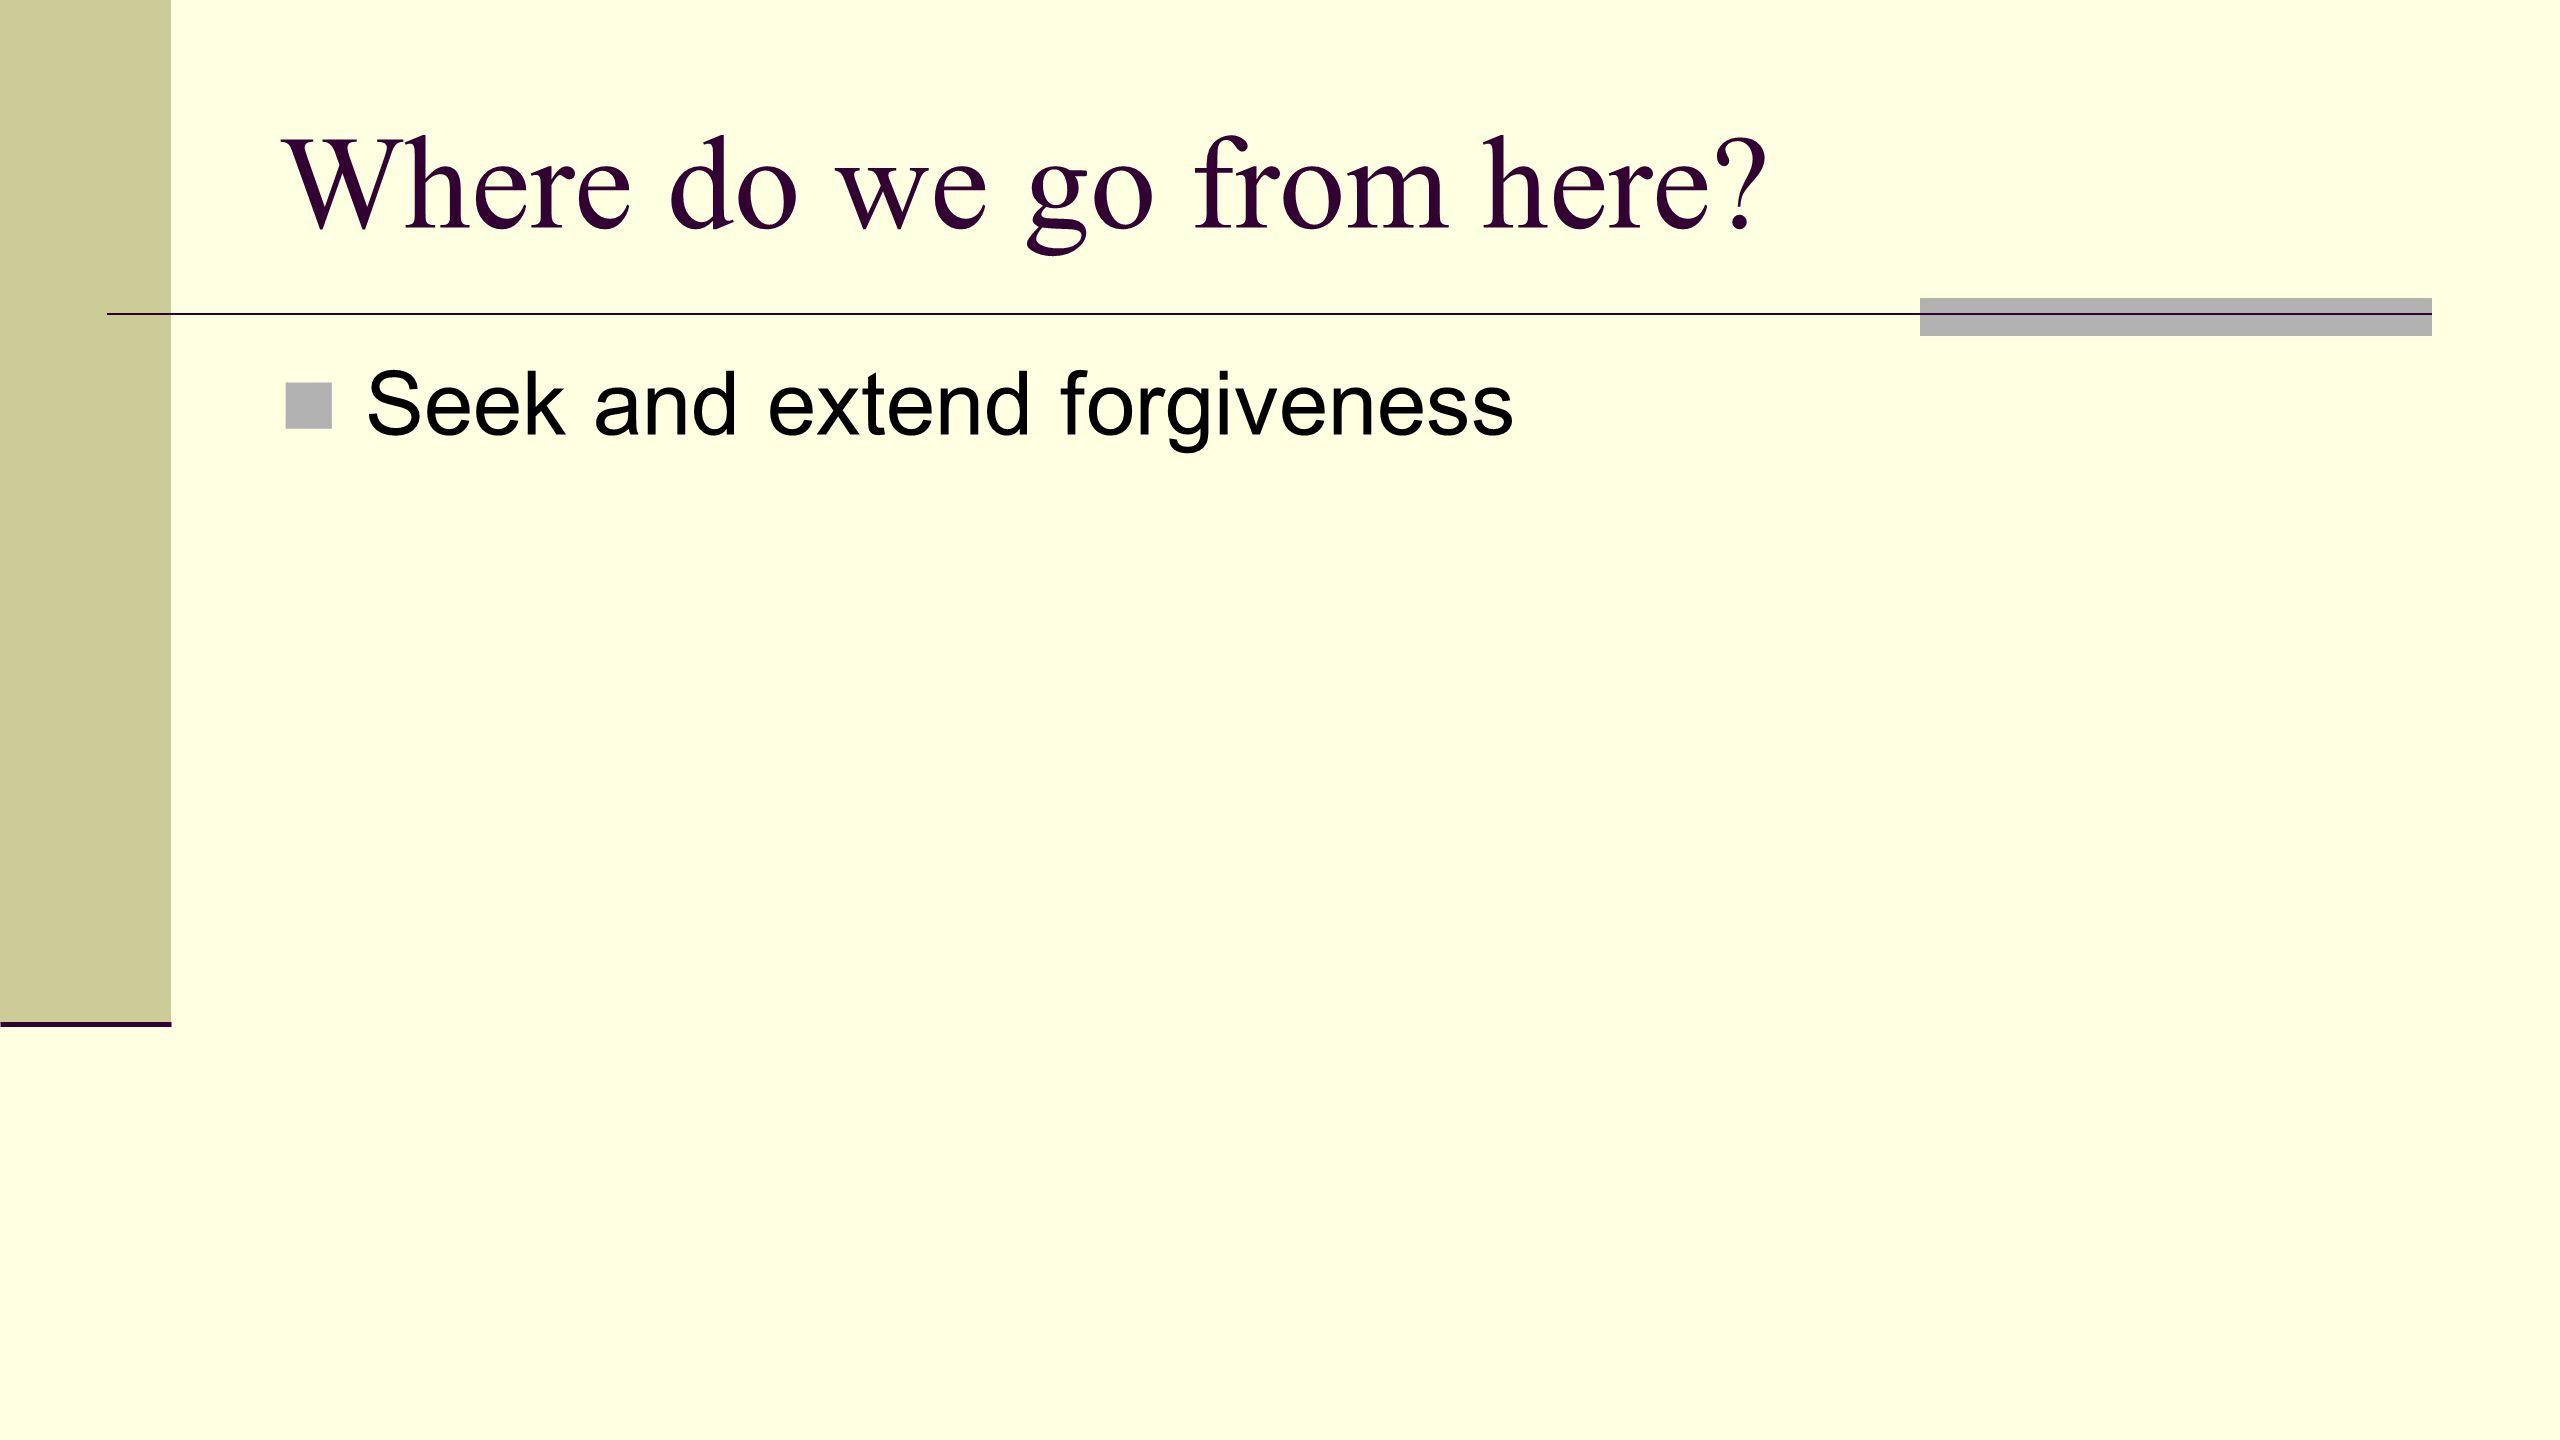 Seek and extend forgiveness